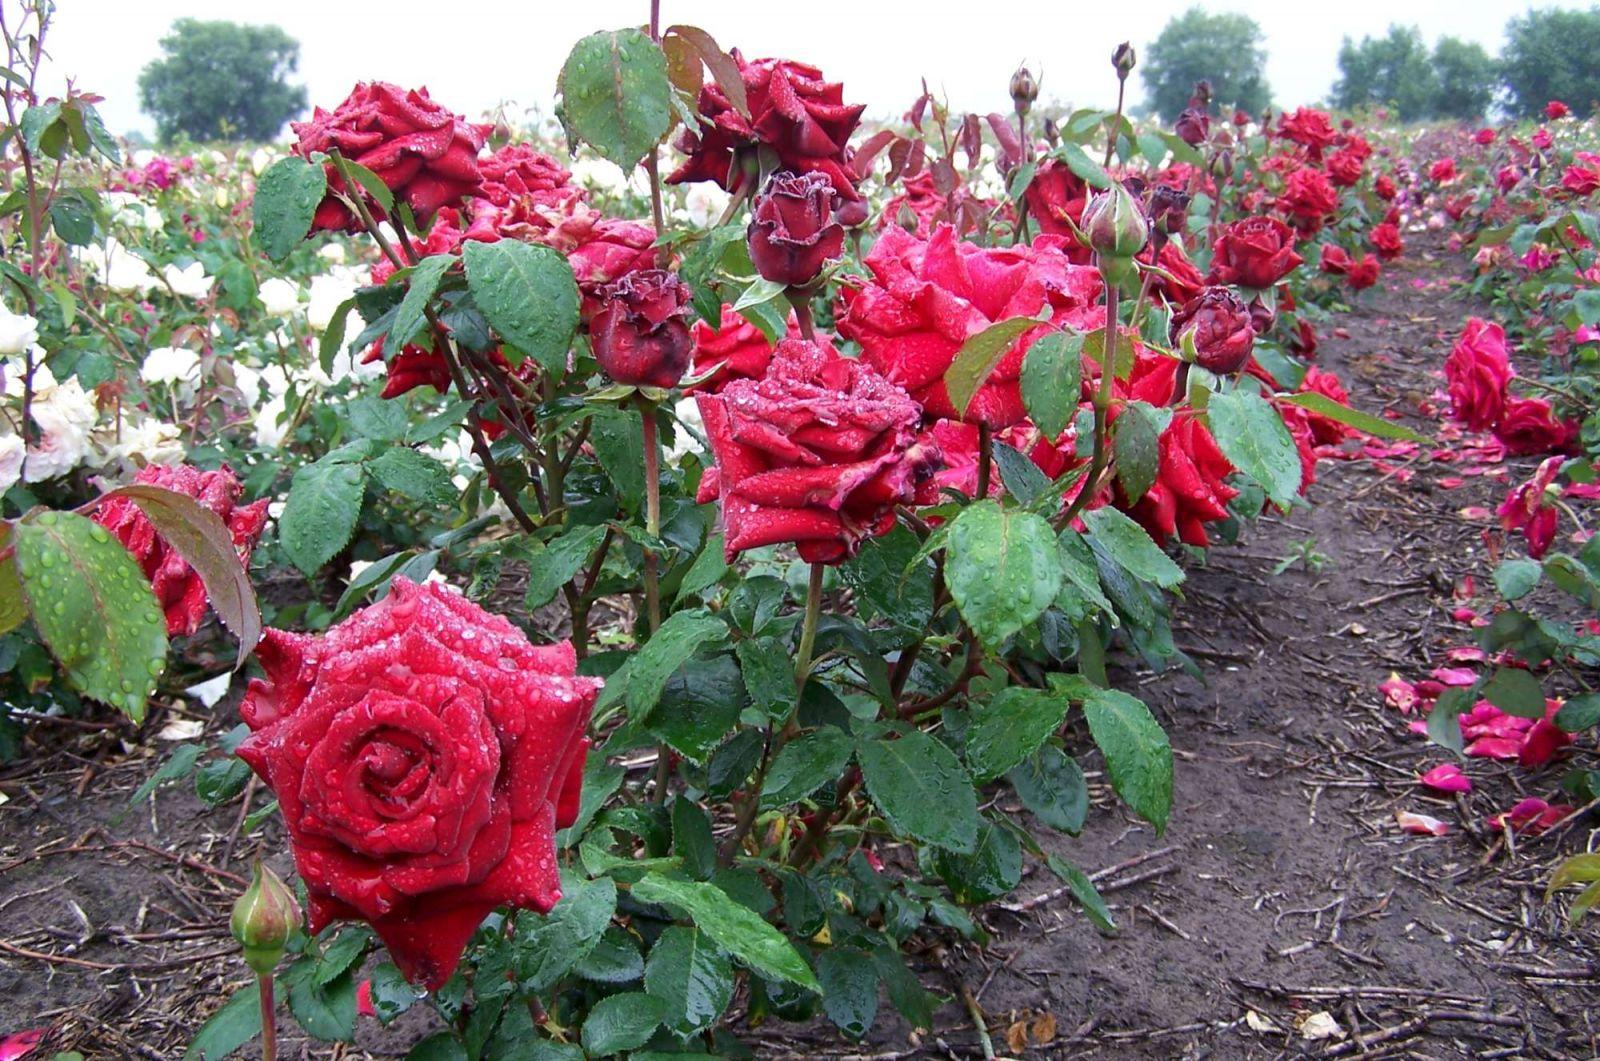 разновидности роз с фото и названиями довольно сильно